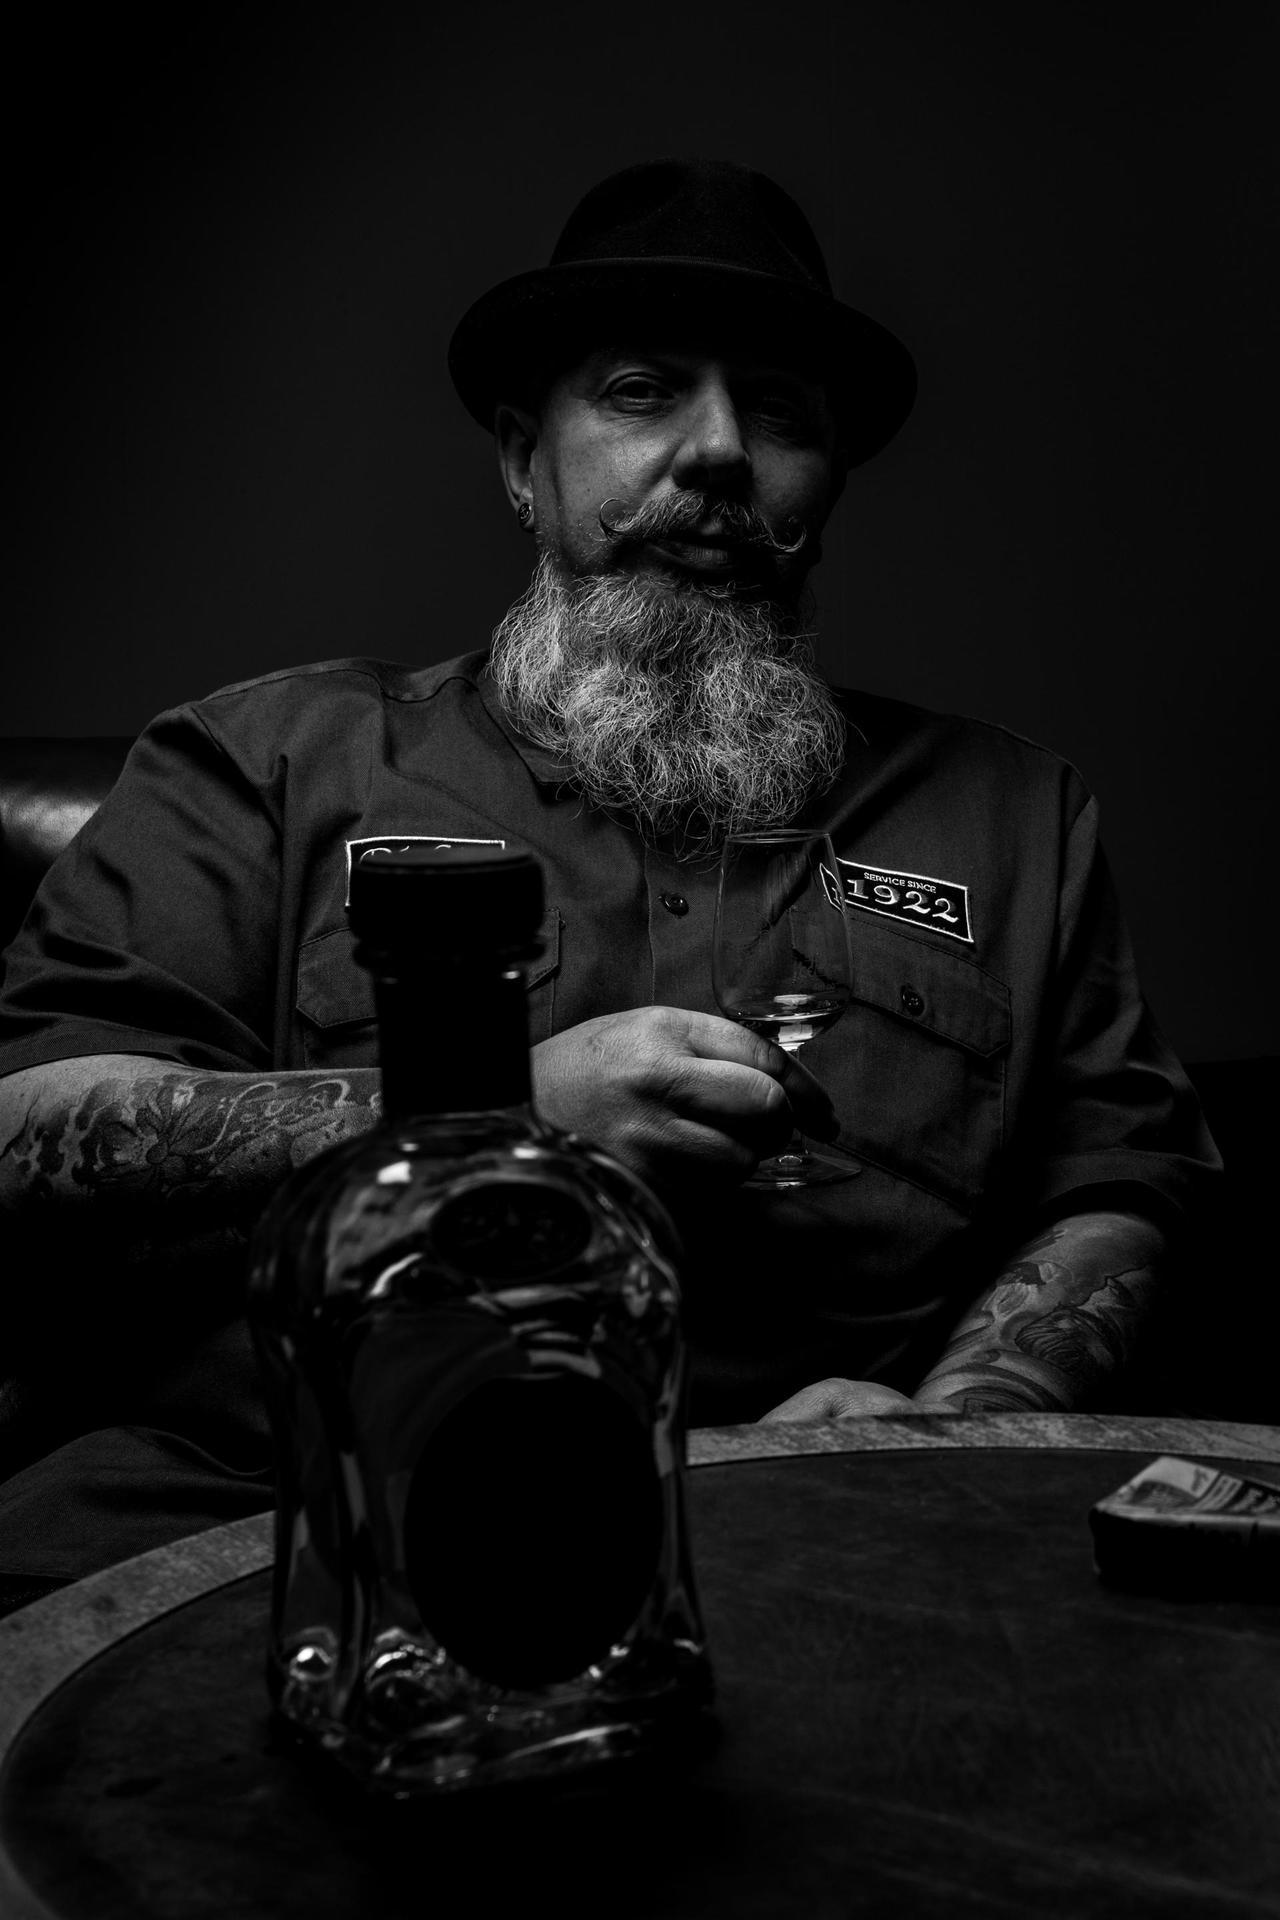 bertolini-photo-jacktheripper-barbershop-2